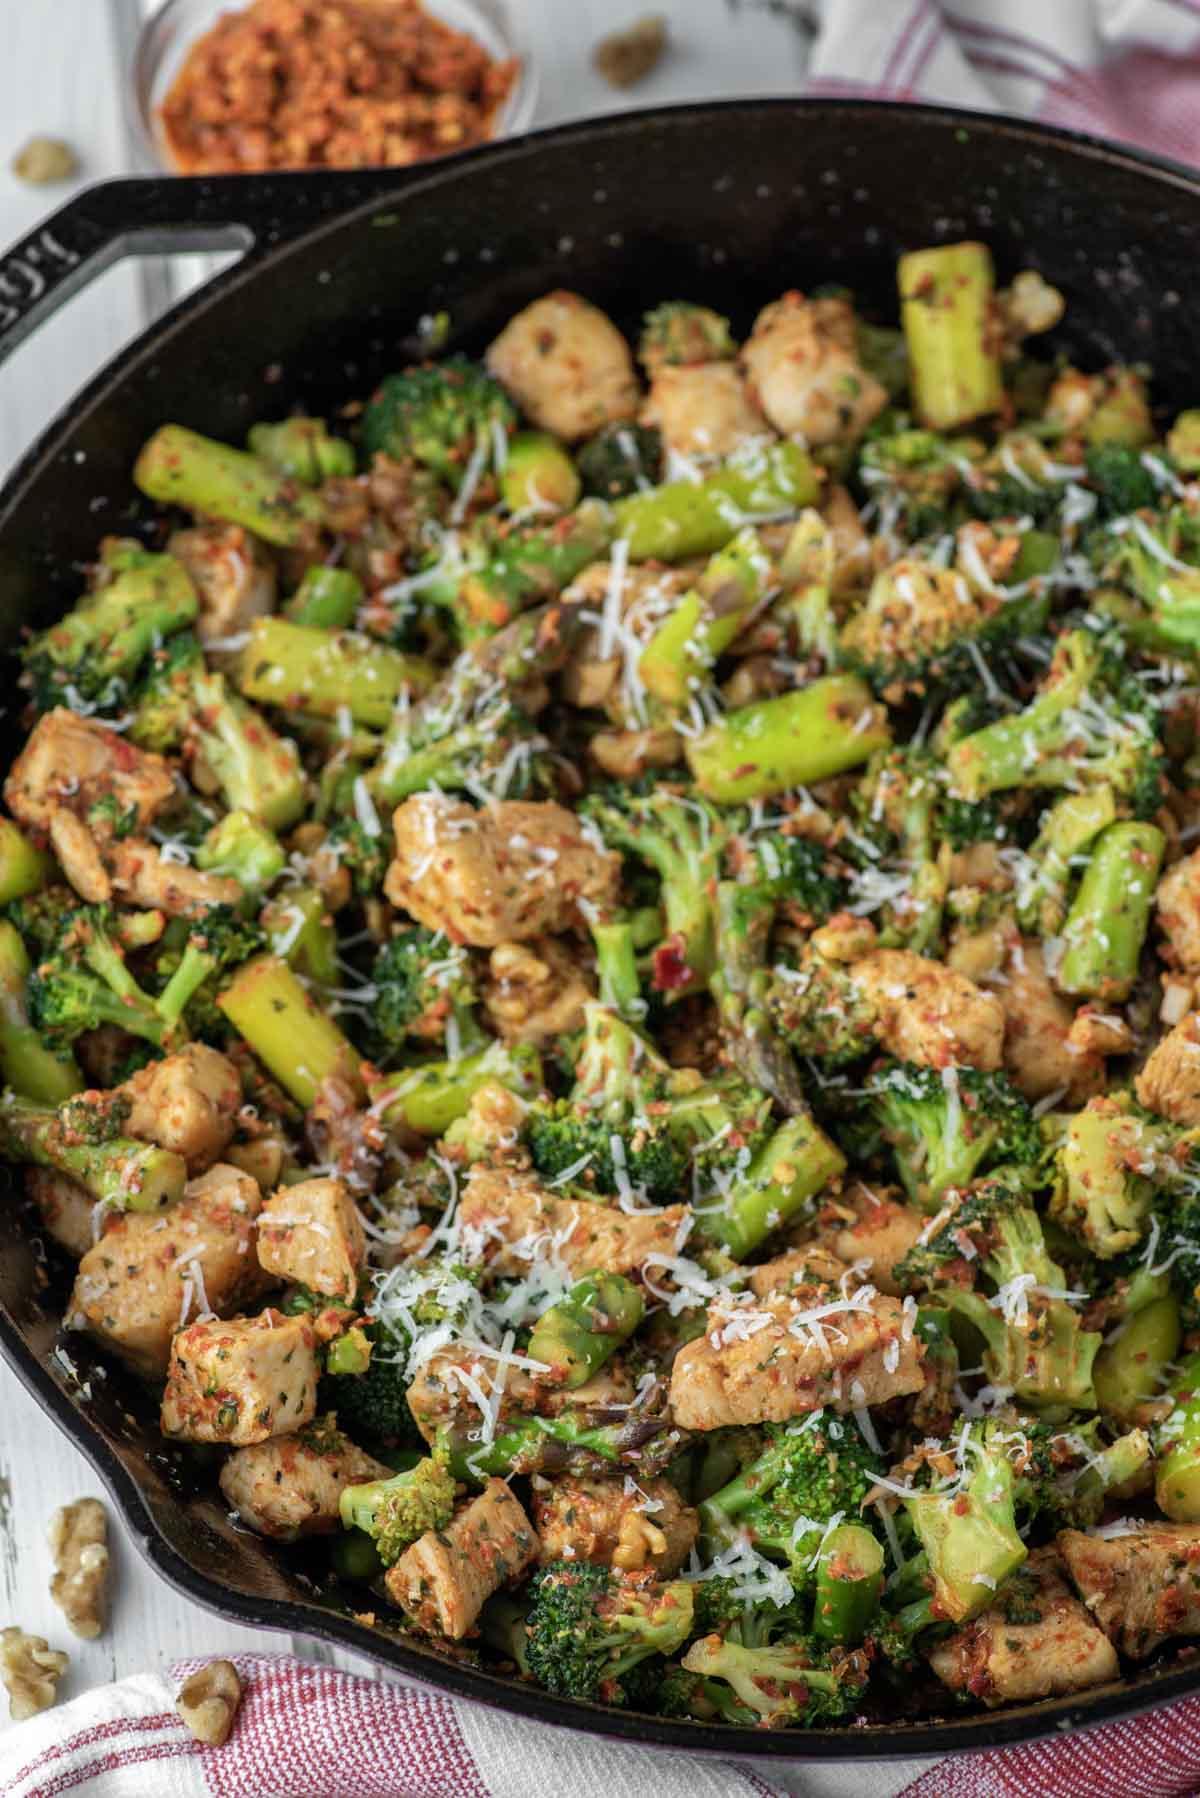 chicken and veggies in skillet